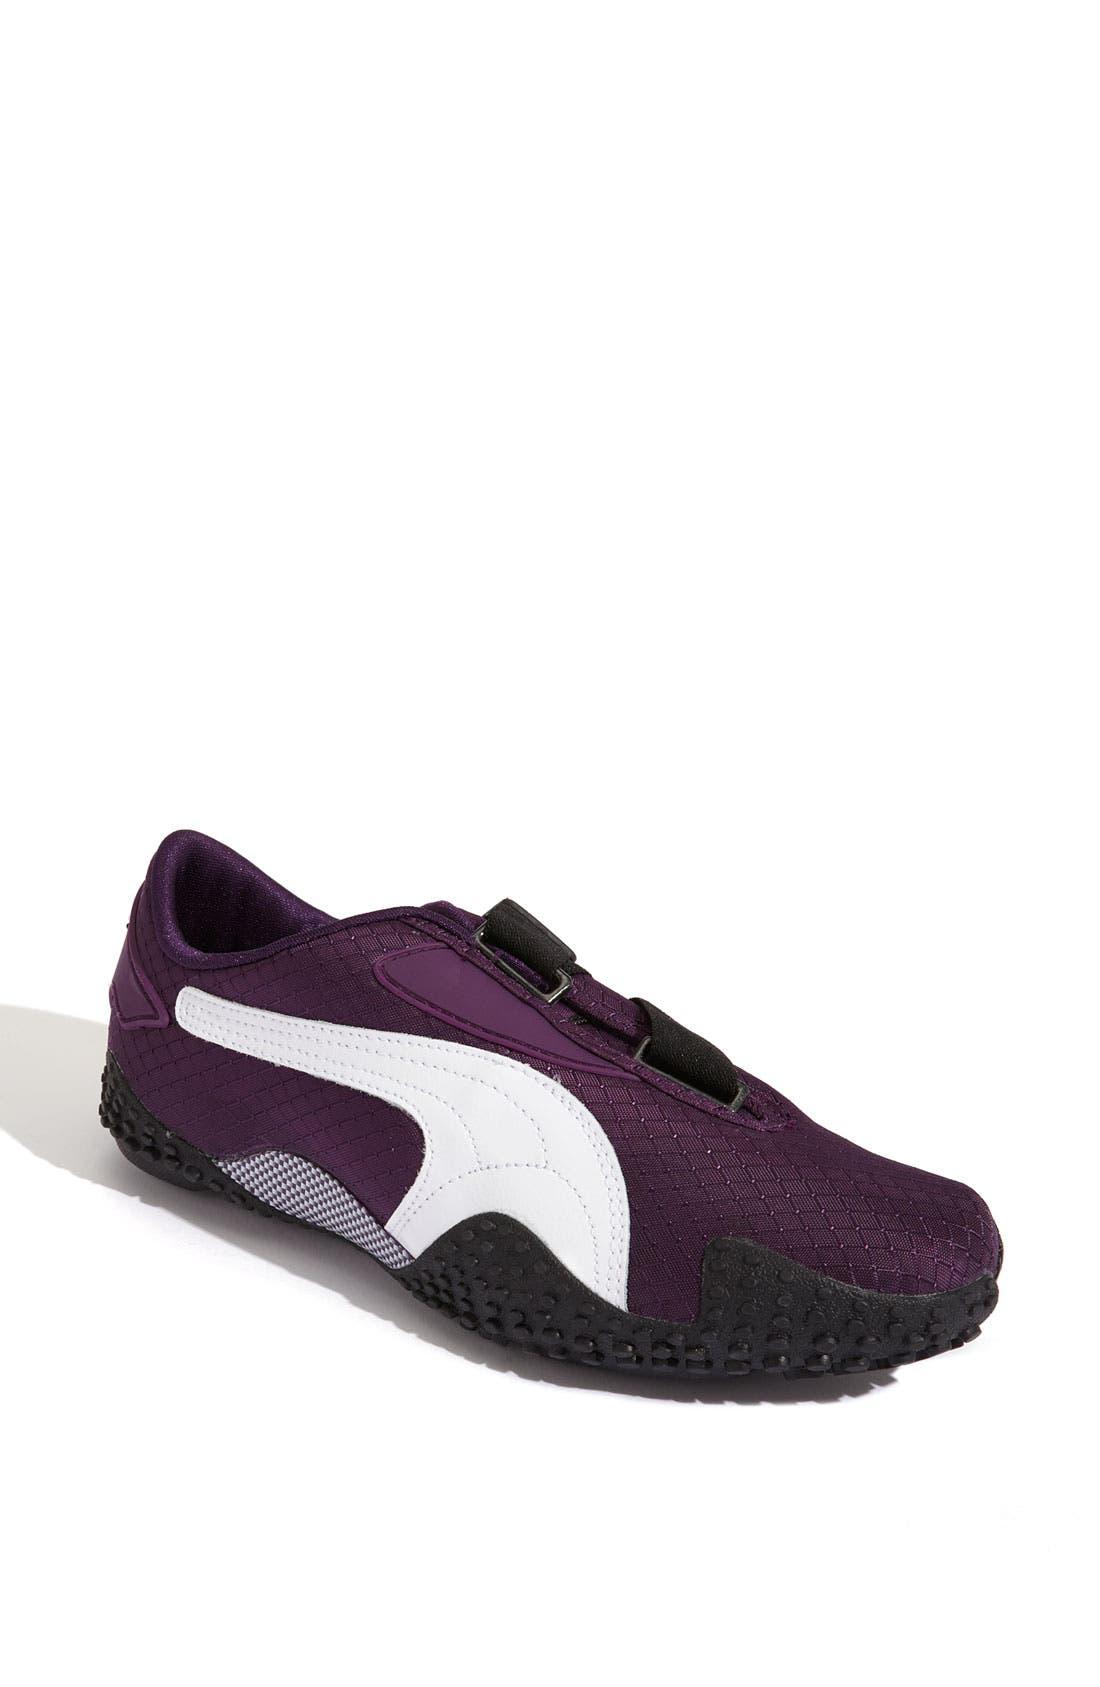 Alternate Image 1 Selected - PUMA 'Mostro Ripstop 2' Sneaker (Women)